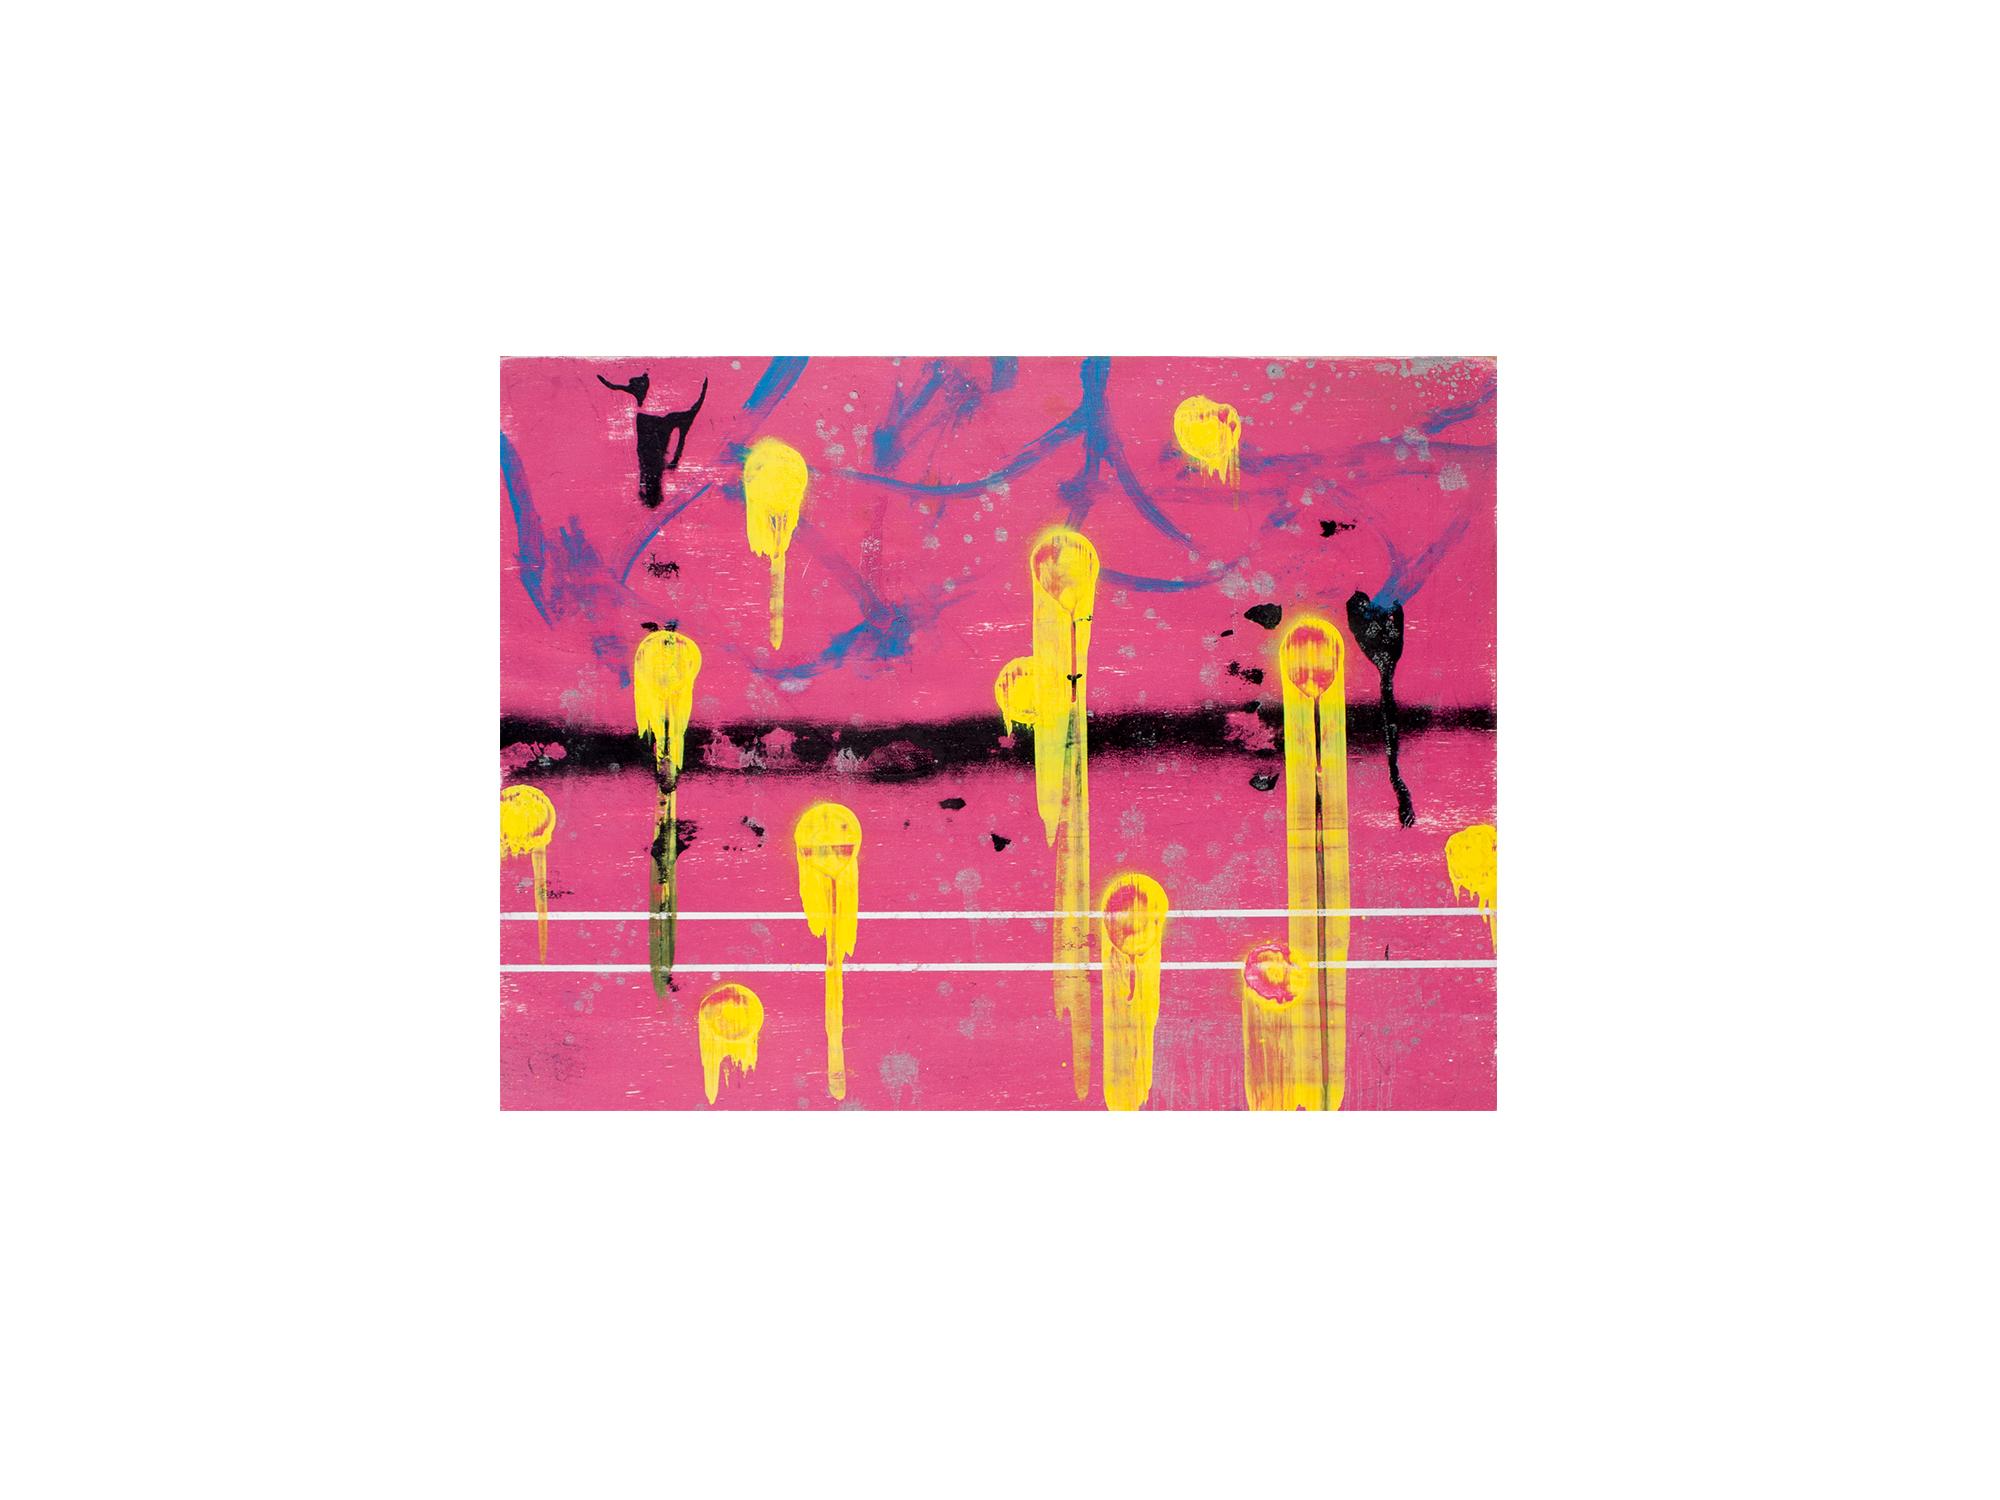 Brett McMahon   KL City 5 , 2017 acrylic and enamel on ply panel 60 x 80cm   ARTIST BIO